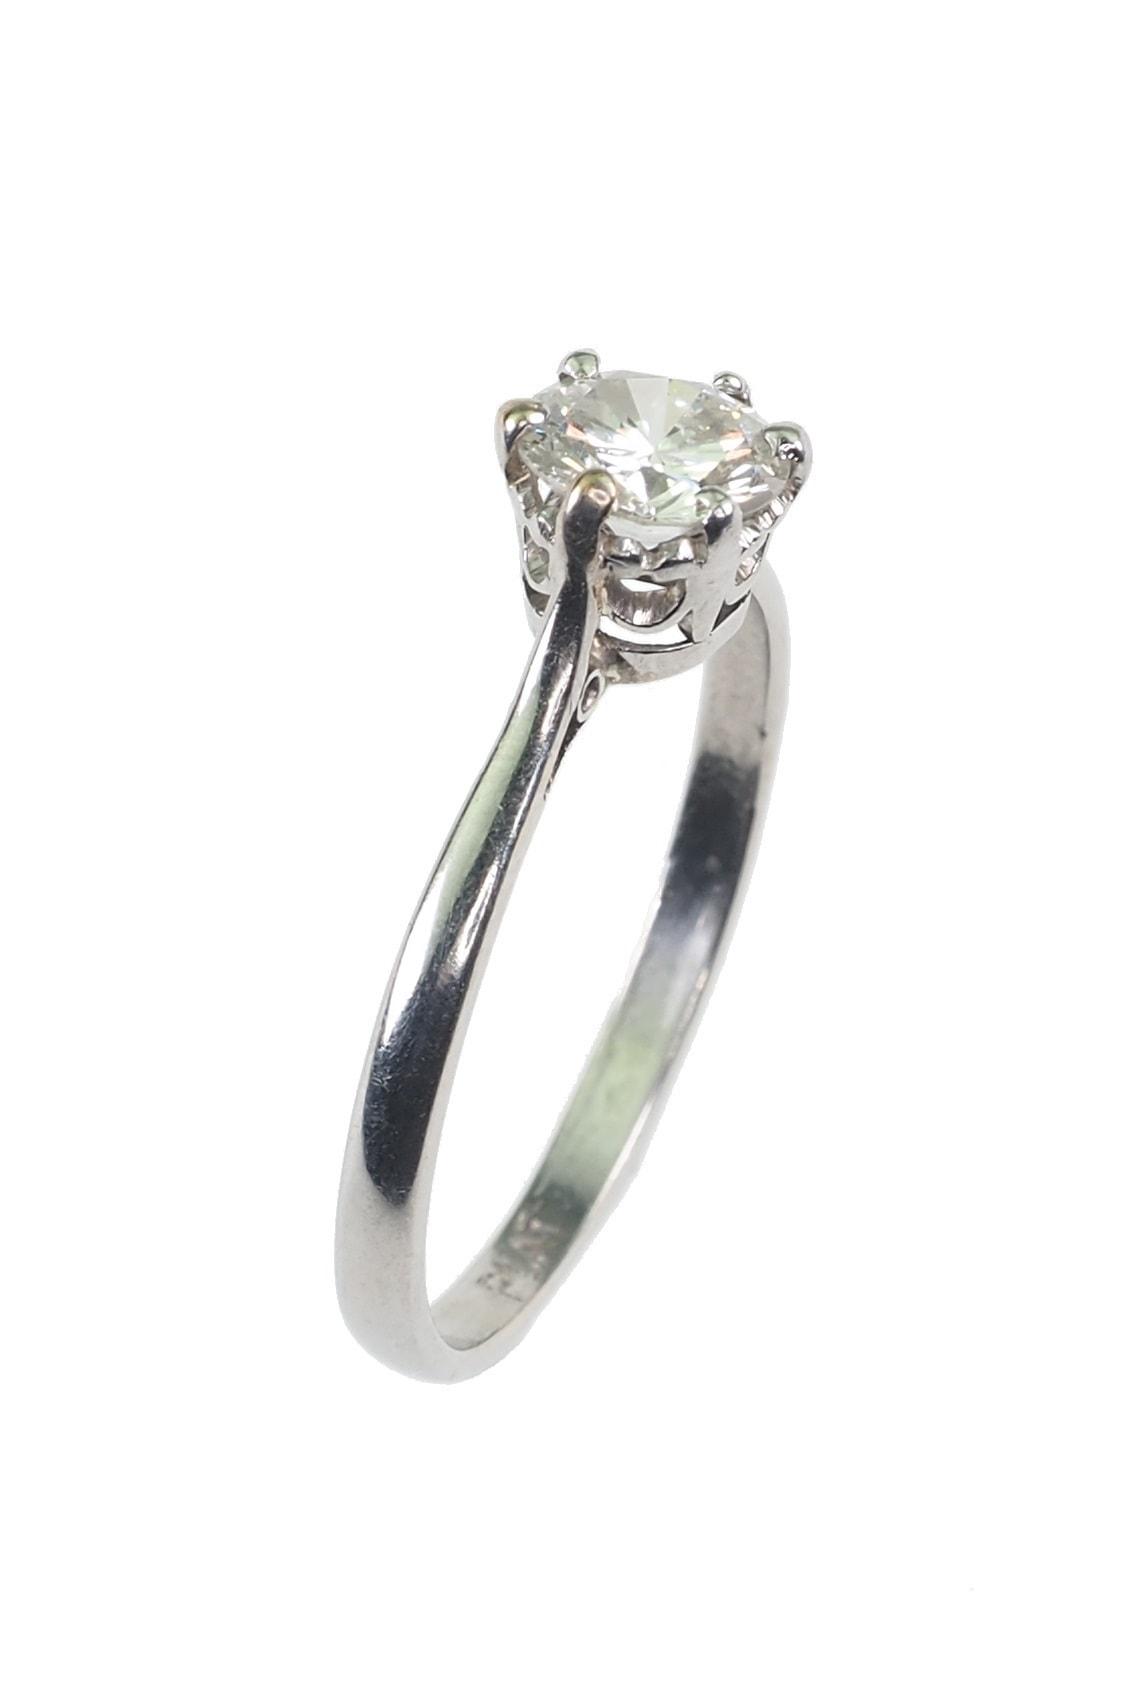 zertifizierten-Diamantschmuck-kaufen-0215b